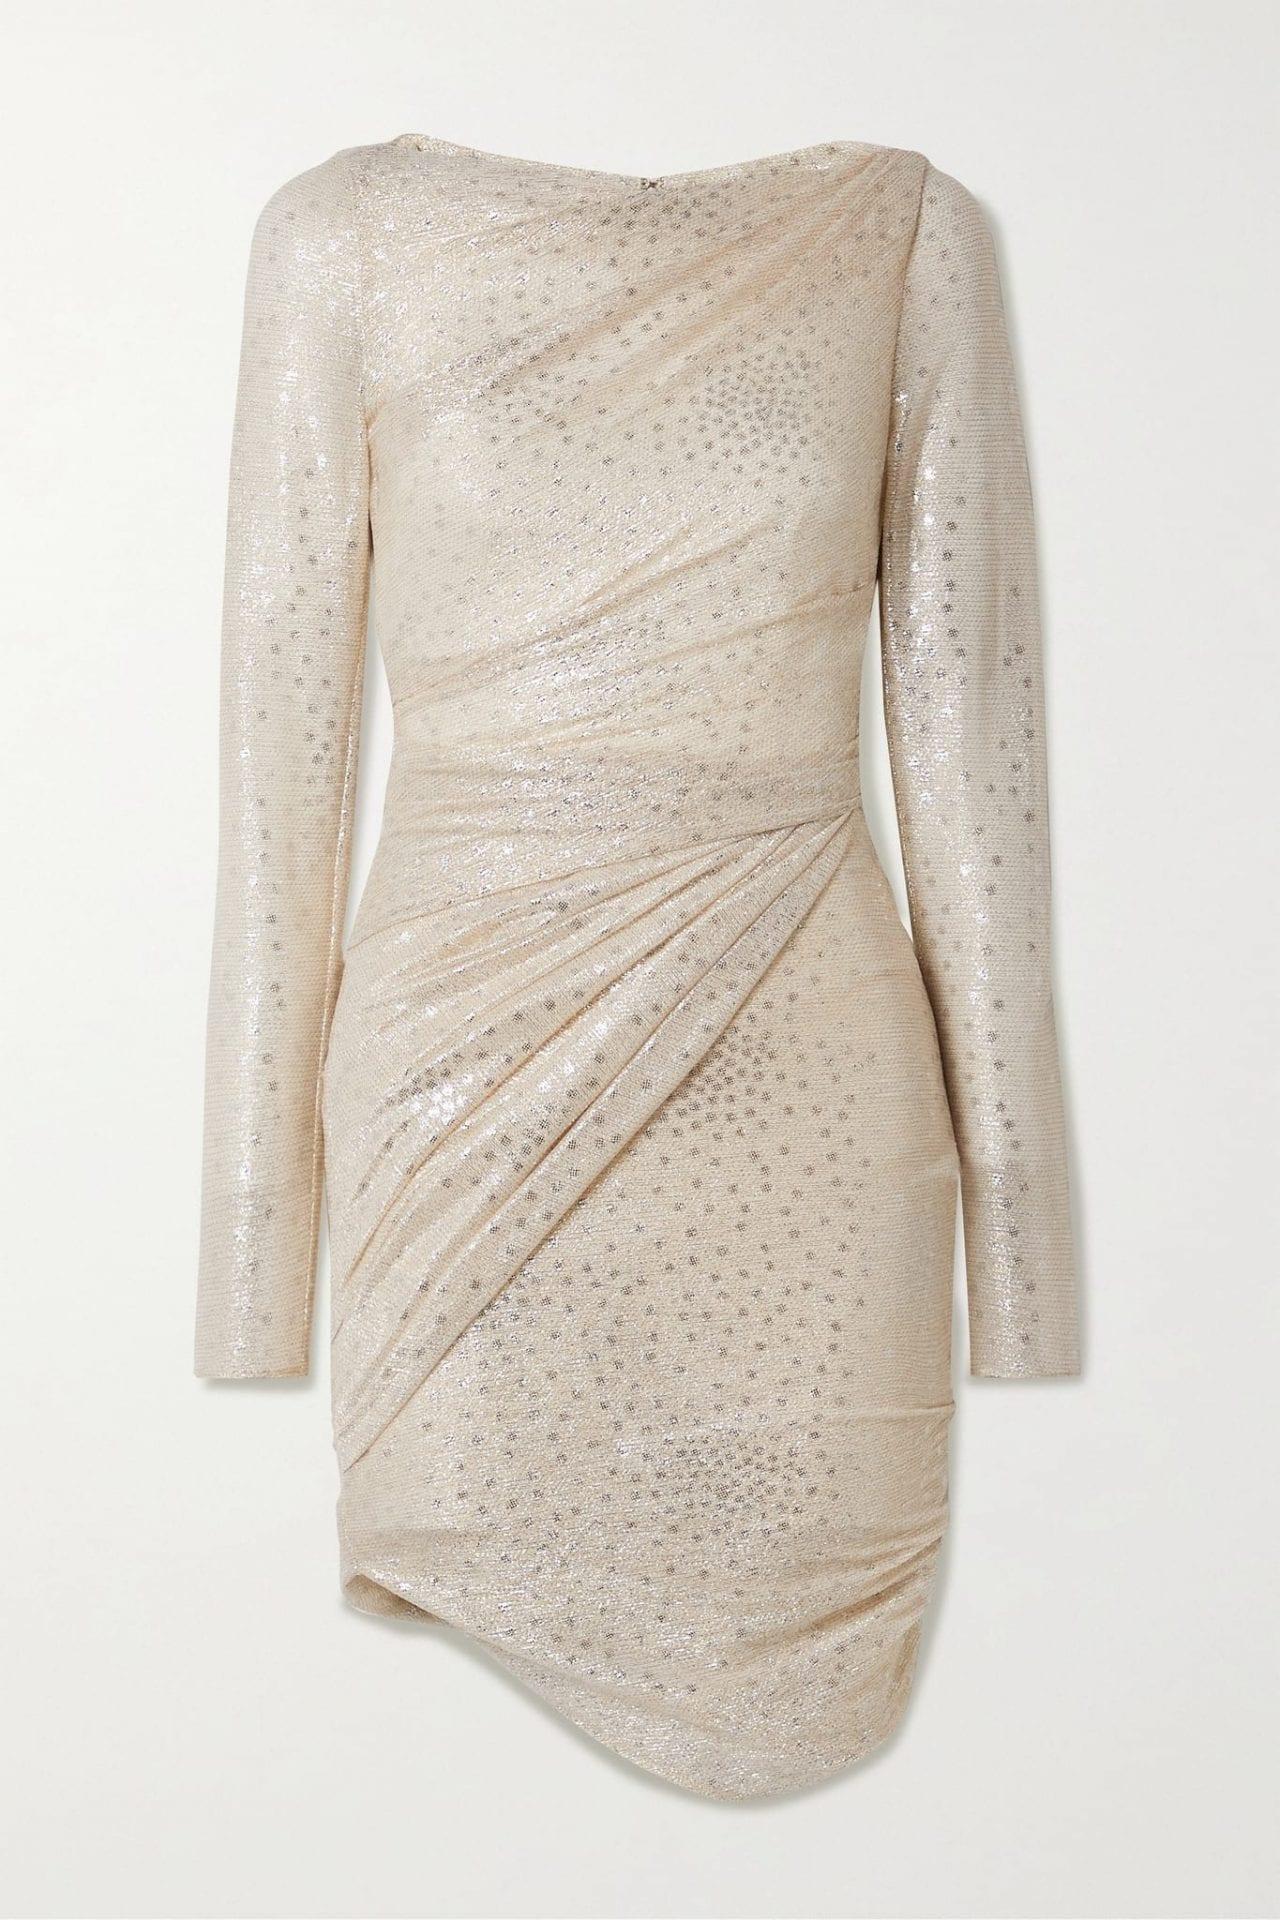 TALBOT RUNHOF Botanic1 Ruched Metallic Voile Mini Dress